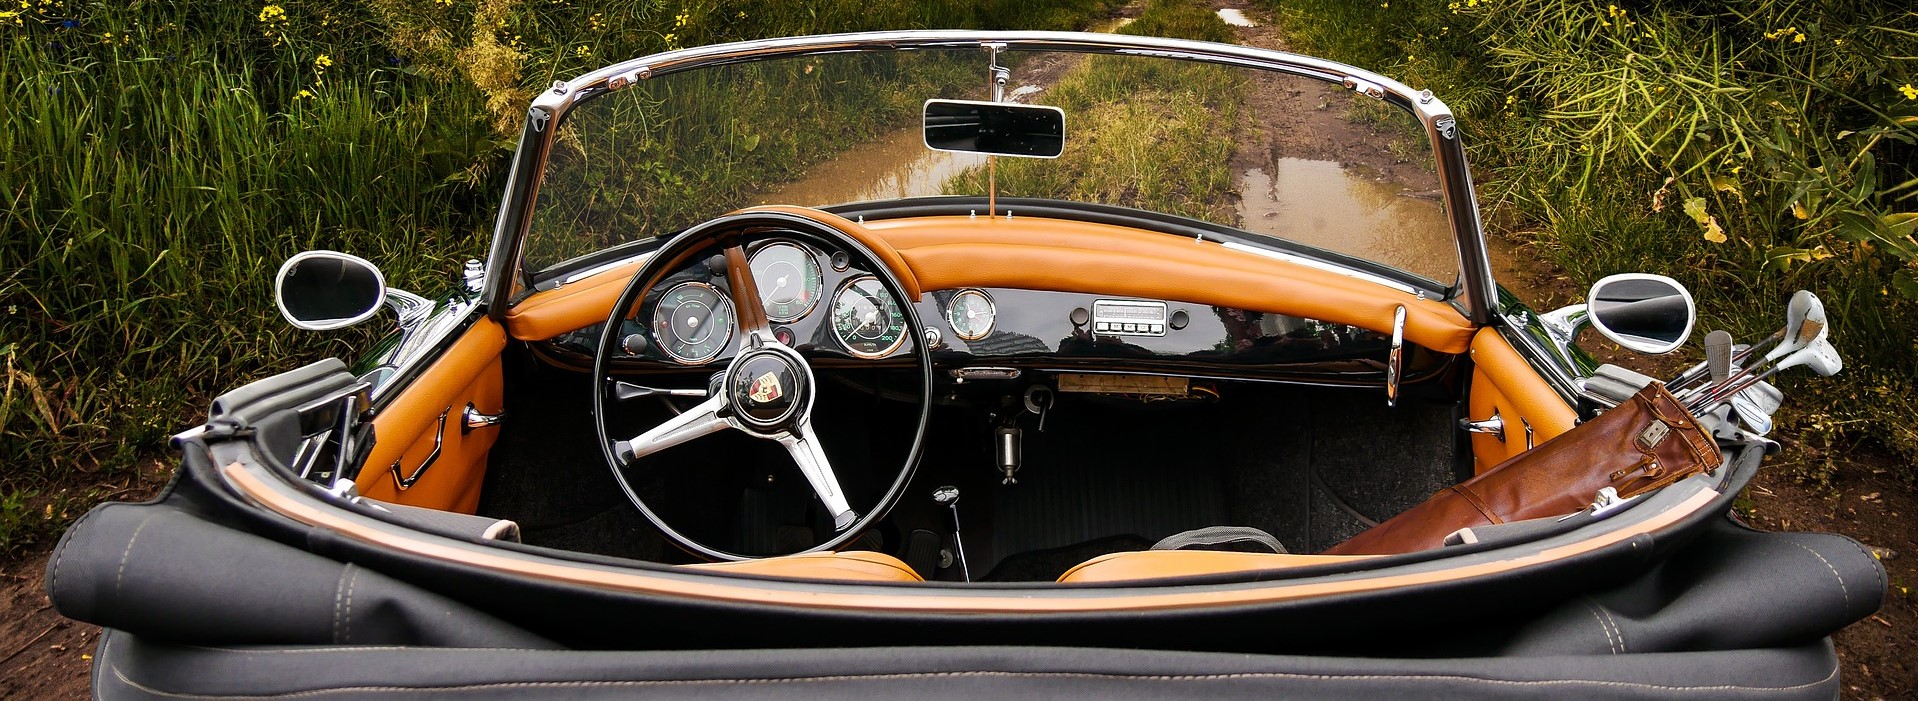 Oldtimer Cabriolet Porsche   Breast Cancer Car Donations